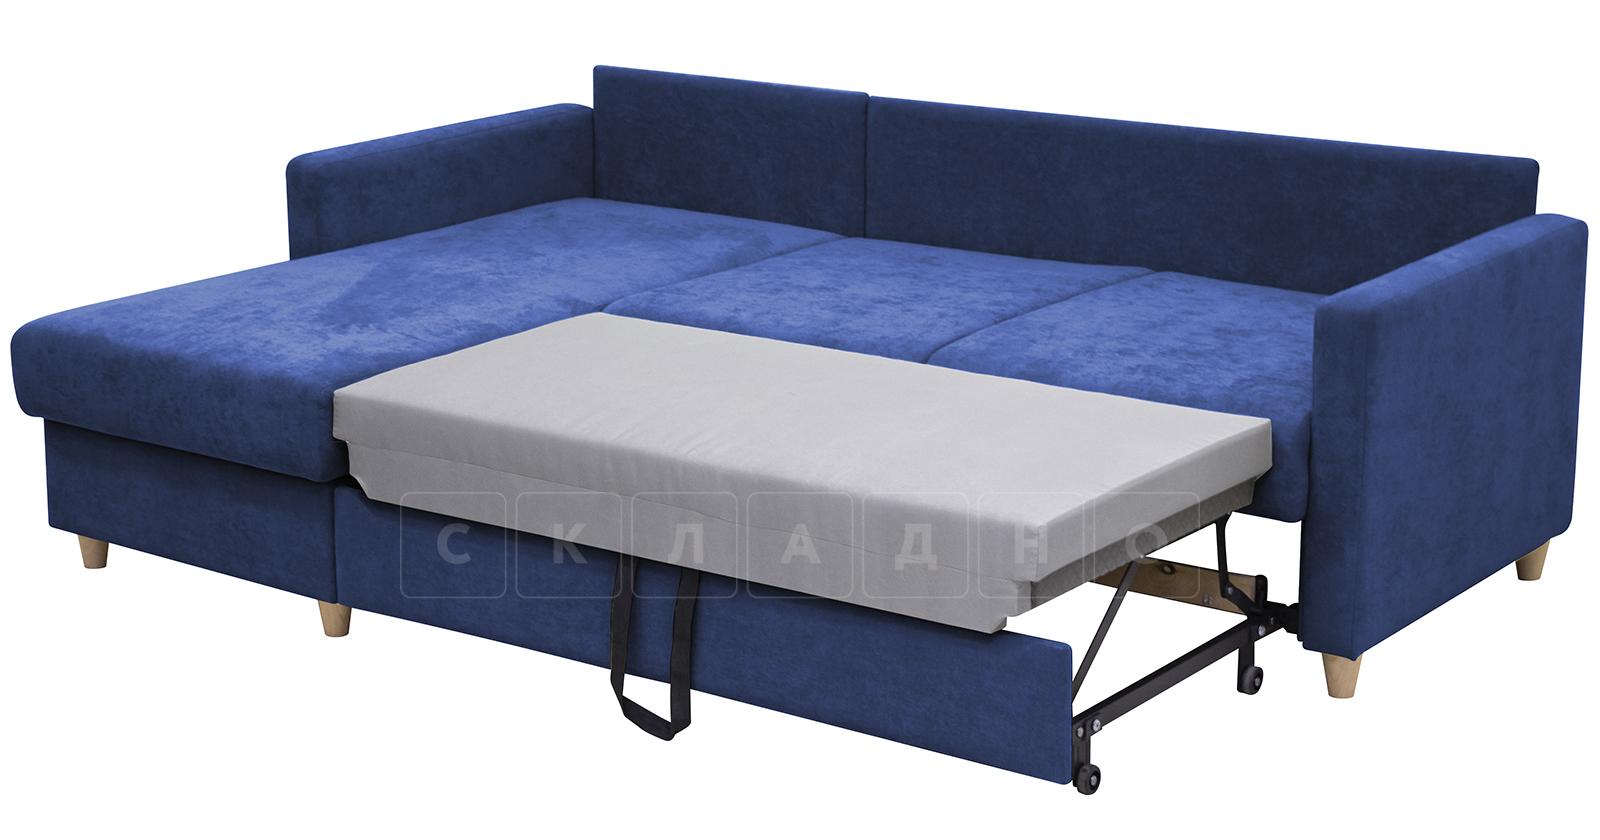 Угловой диван Дарвин темно-синий фото 6 | интернет-магазин Складно